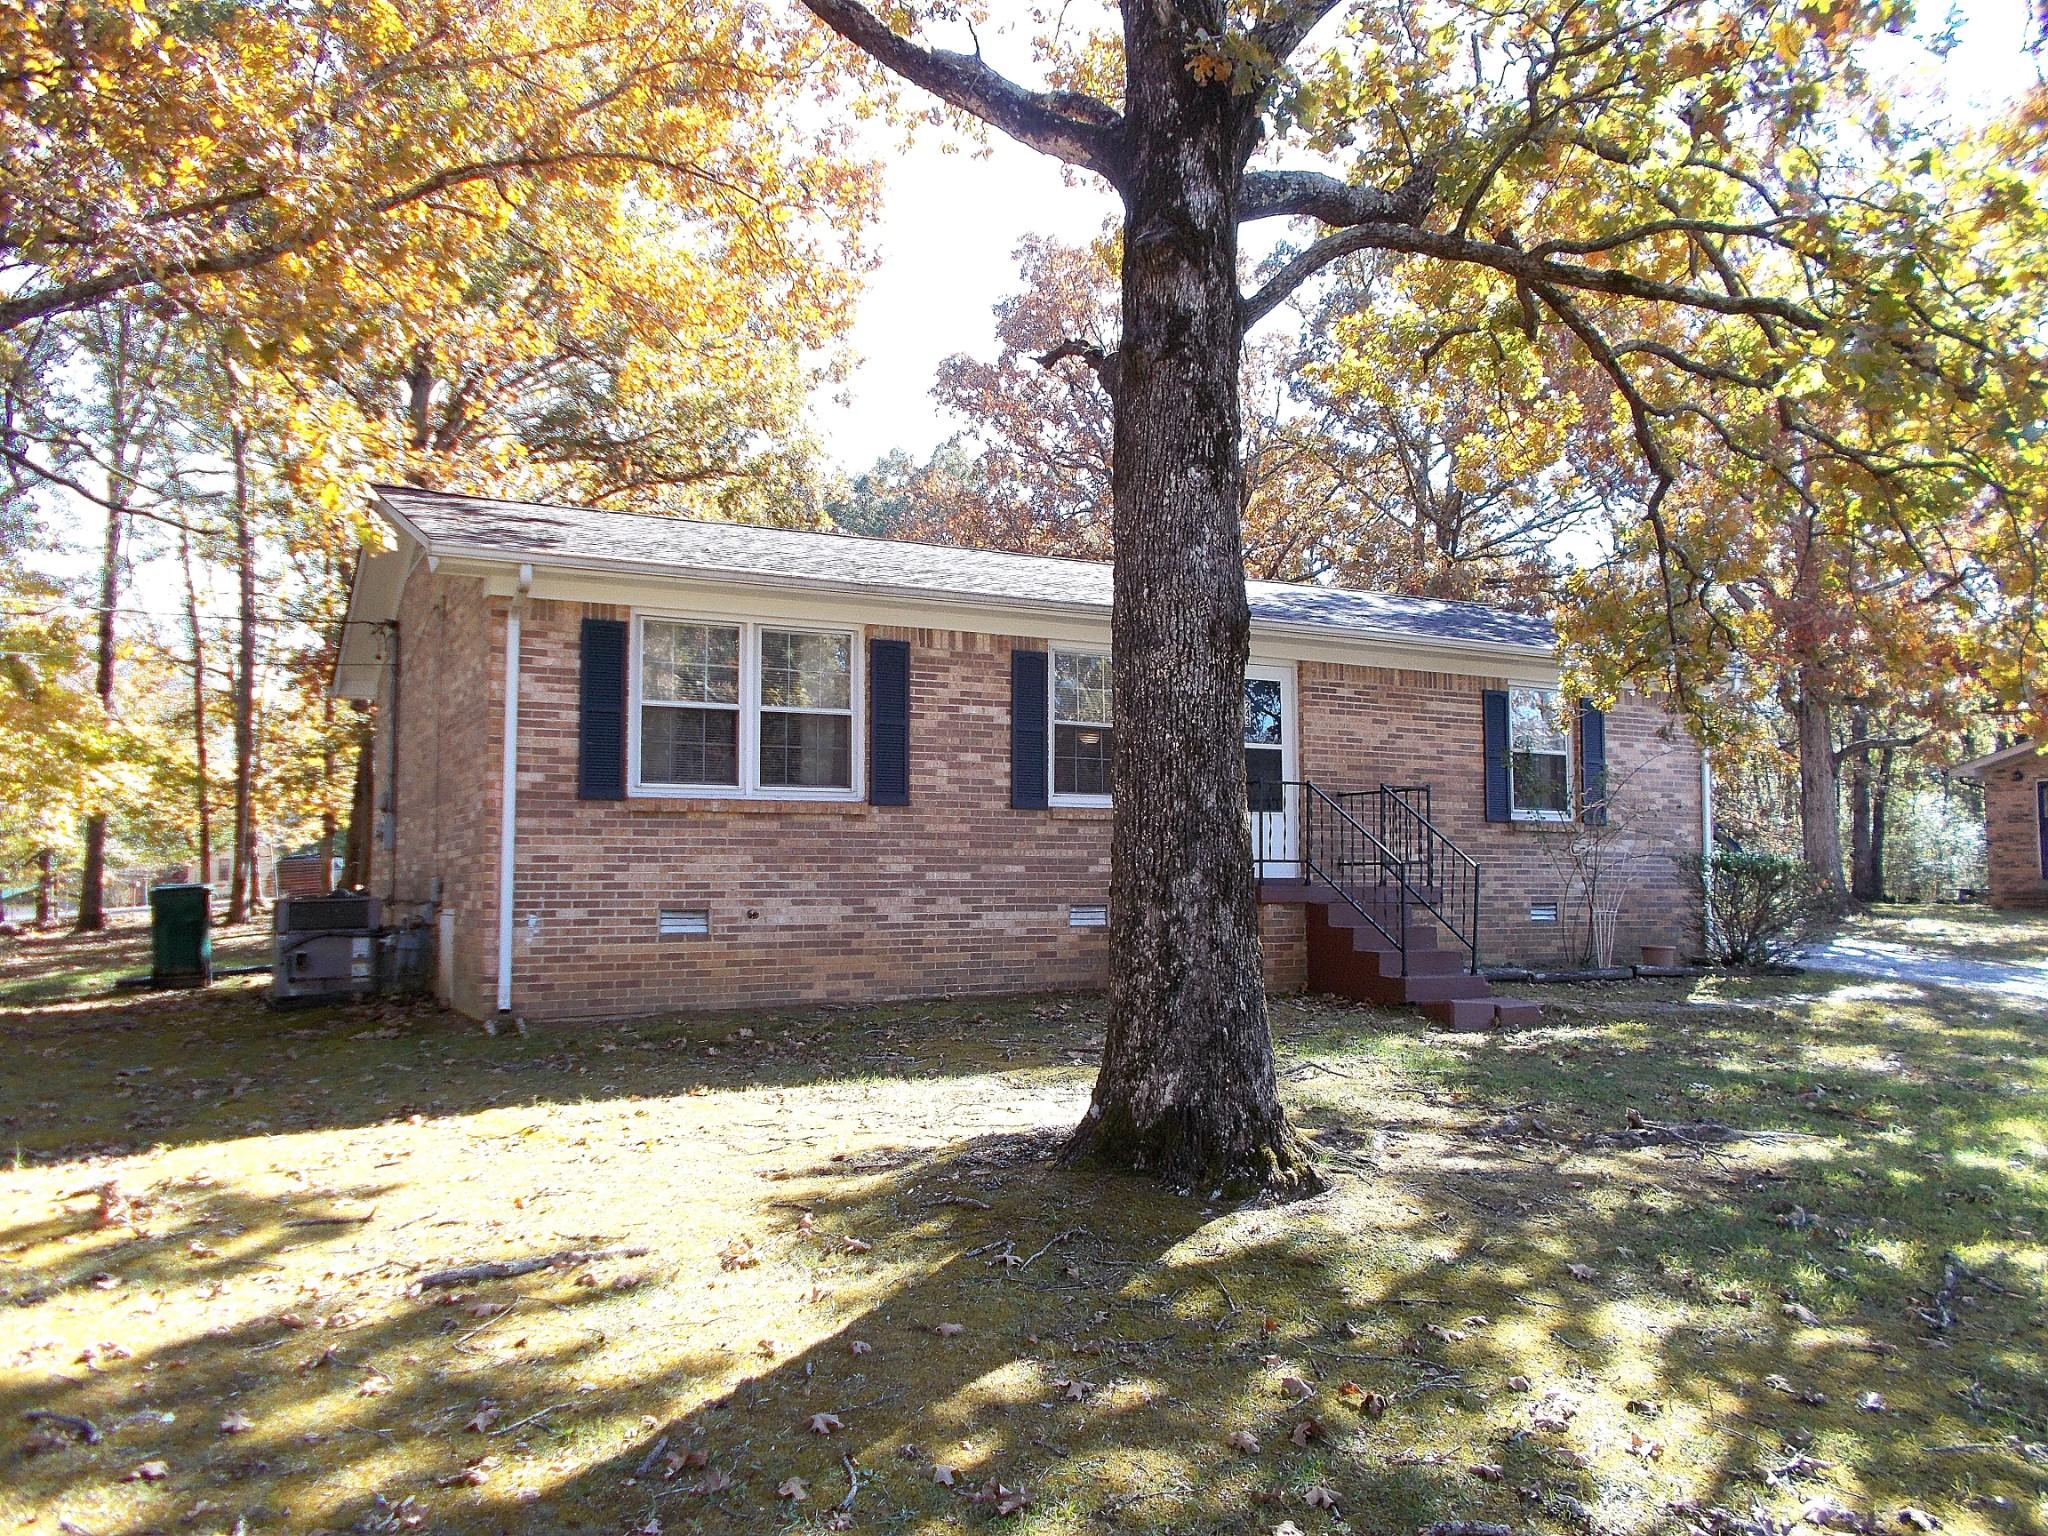 243 Washington Circle, Waverly, TN 37185 - Waverly, TN real estate listing